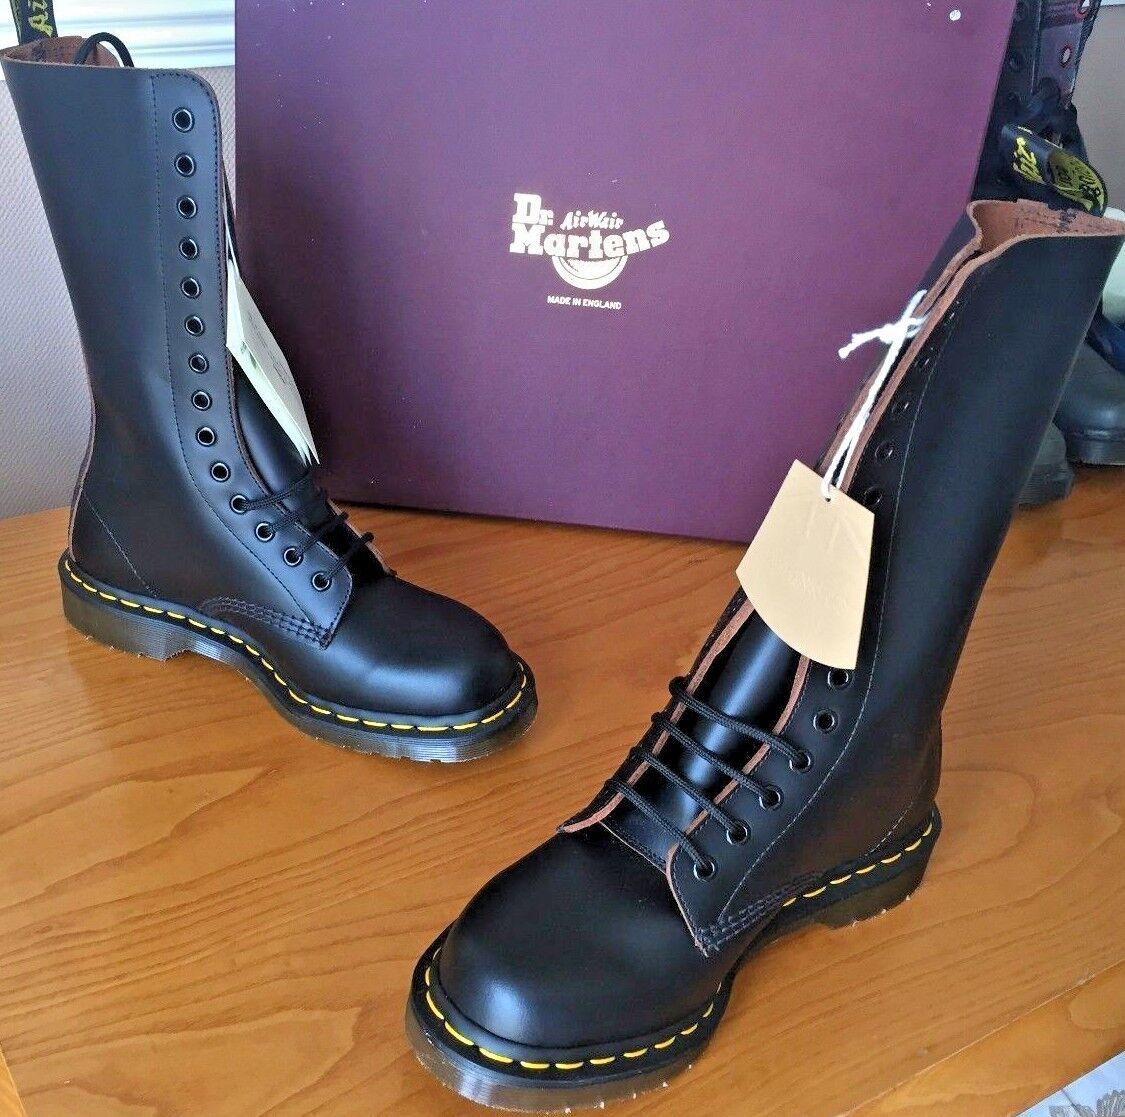 Dr Martens 1914 schwarz quilon leather Stiefel UK 6 6 6 EU 39 Made in England   ef86f7